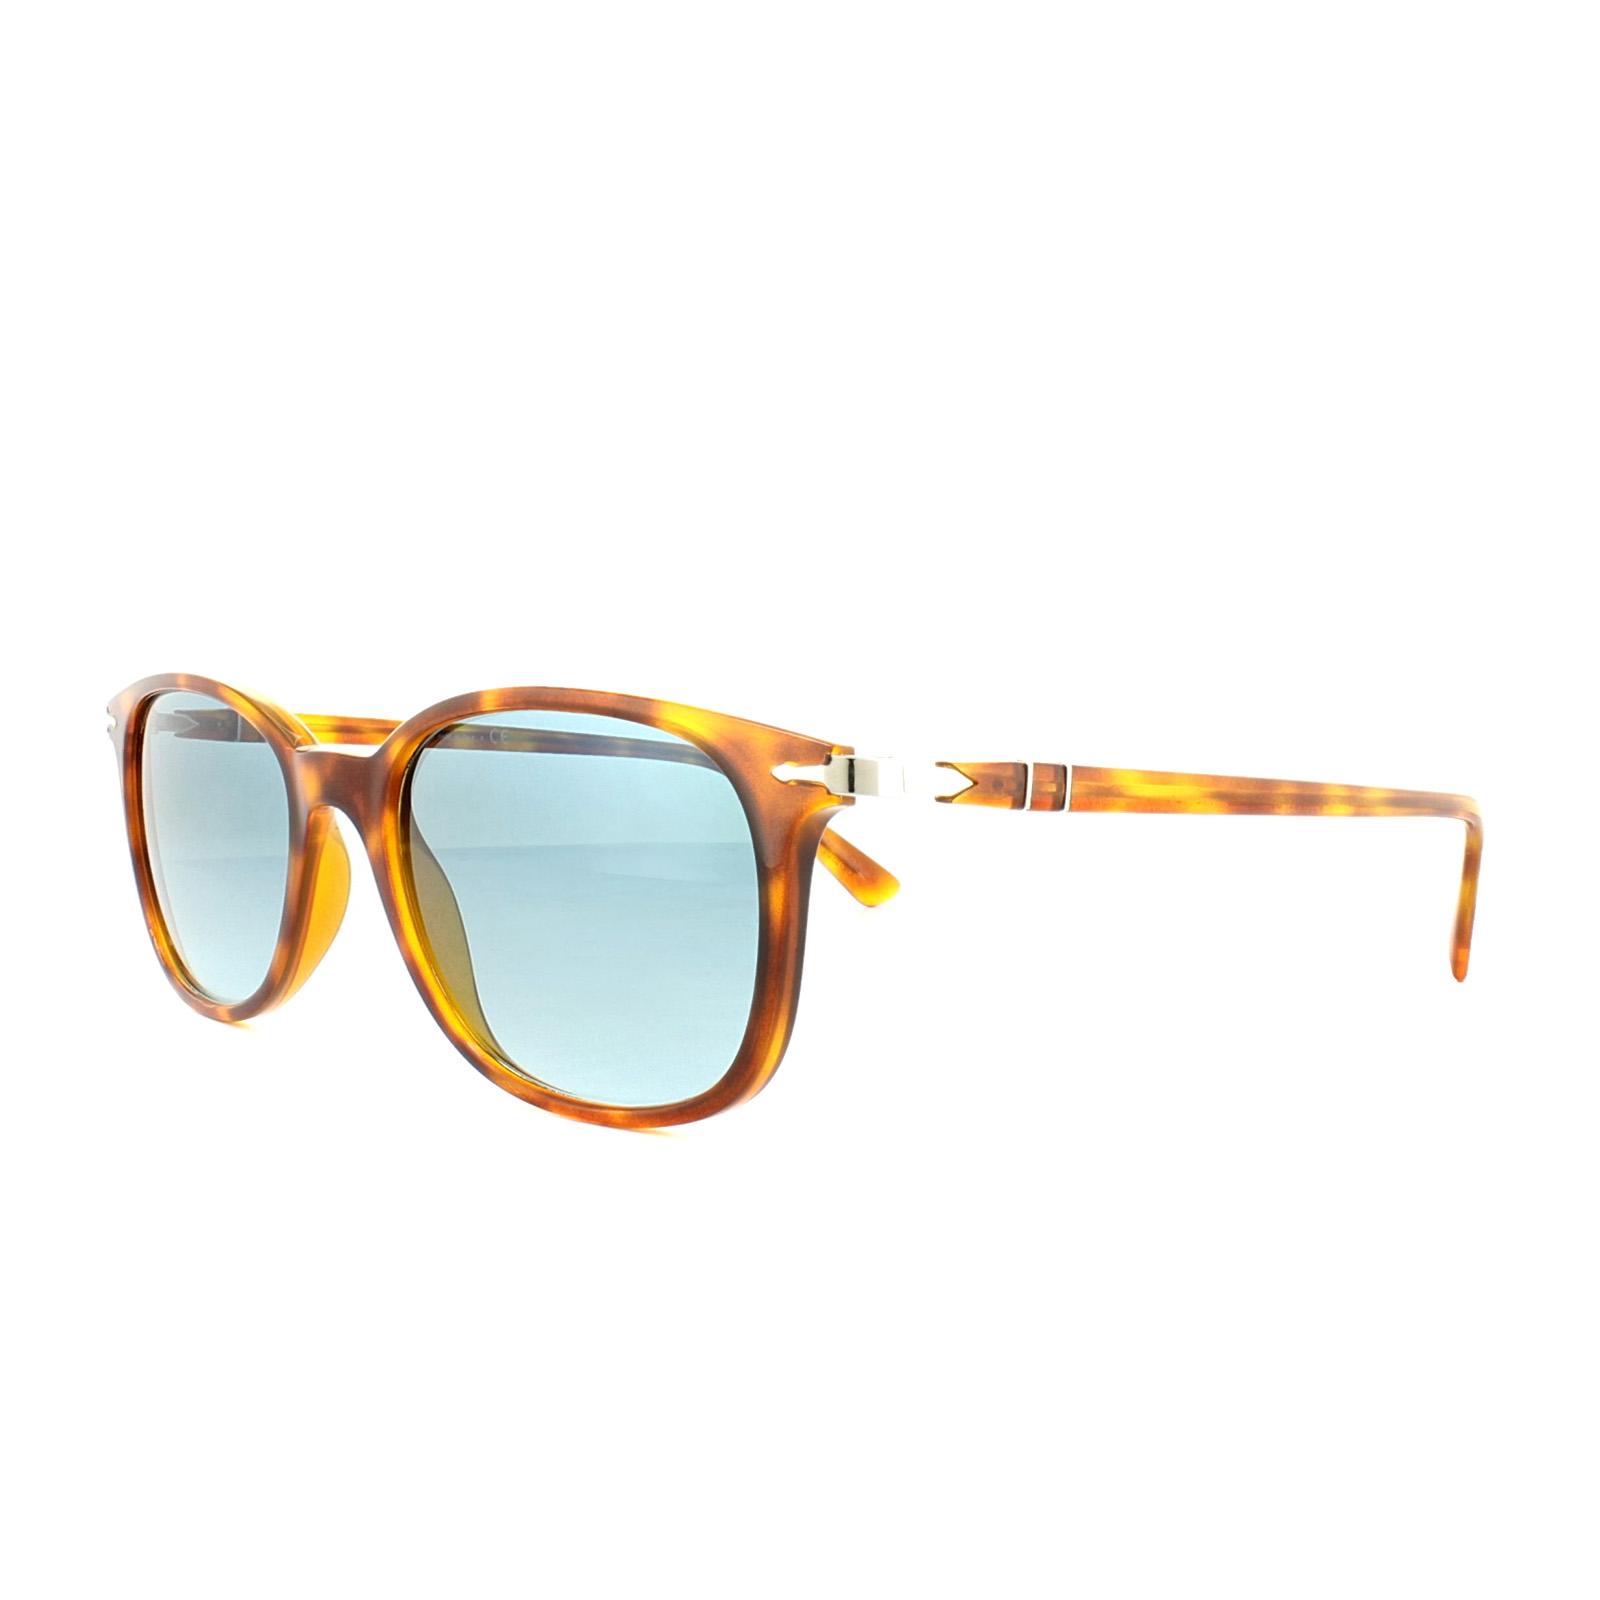 CENTINELA Persol gafas de sol PO3183S 1052Q8 la Habana claro azul azul  gradiente fb7f8714125a